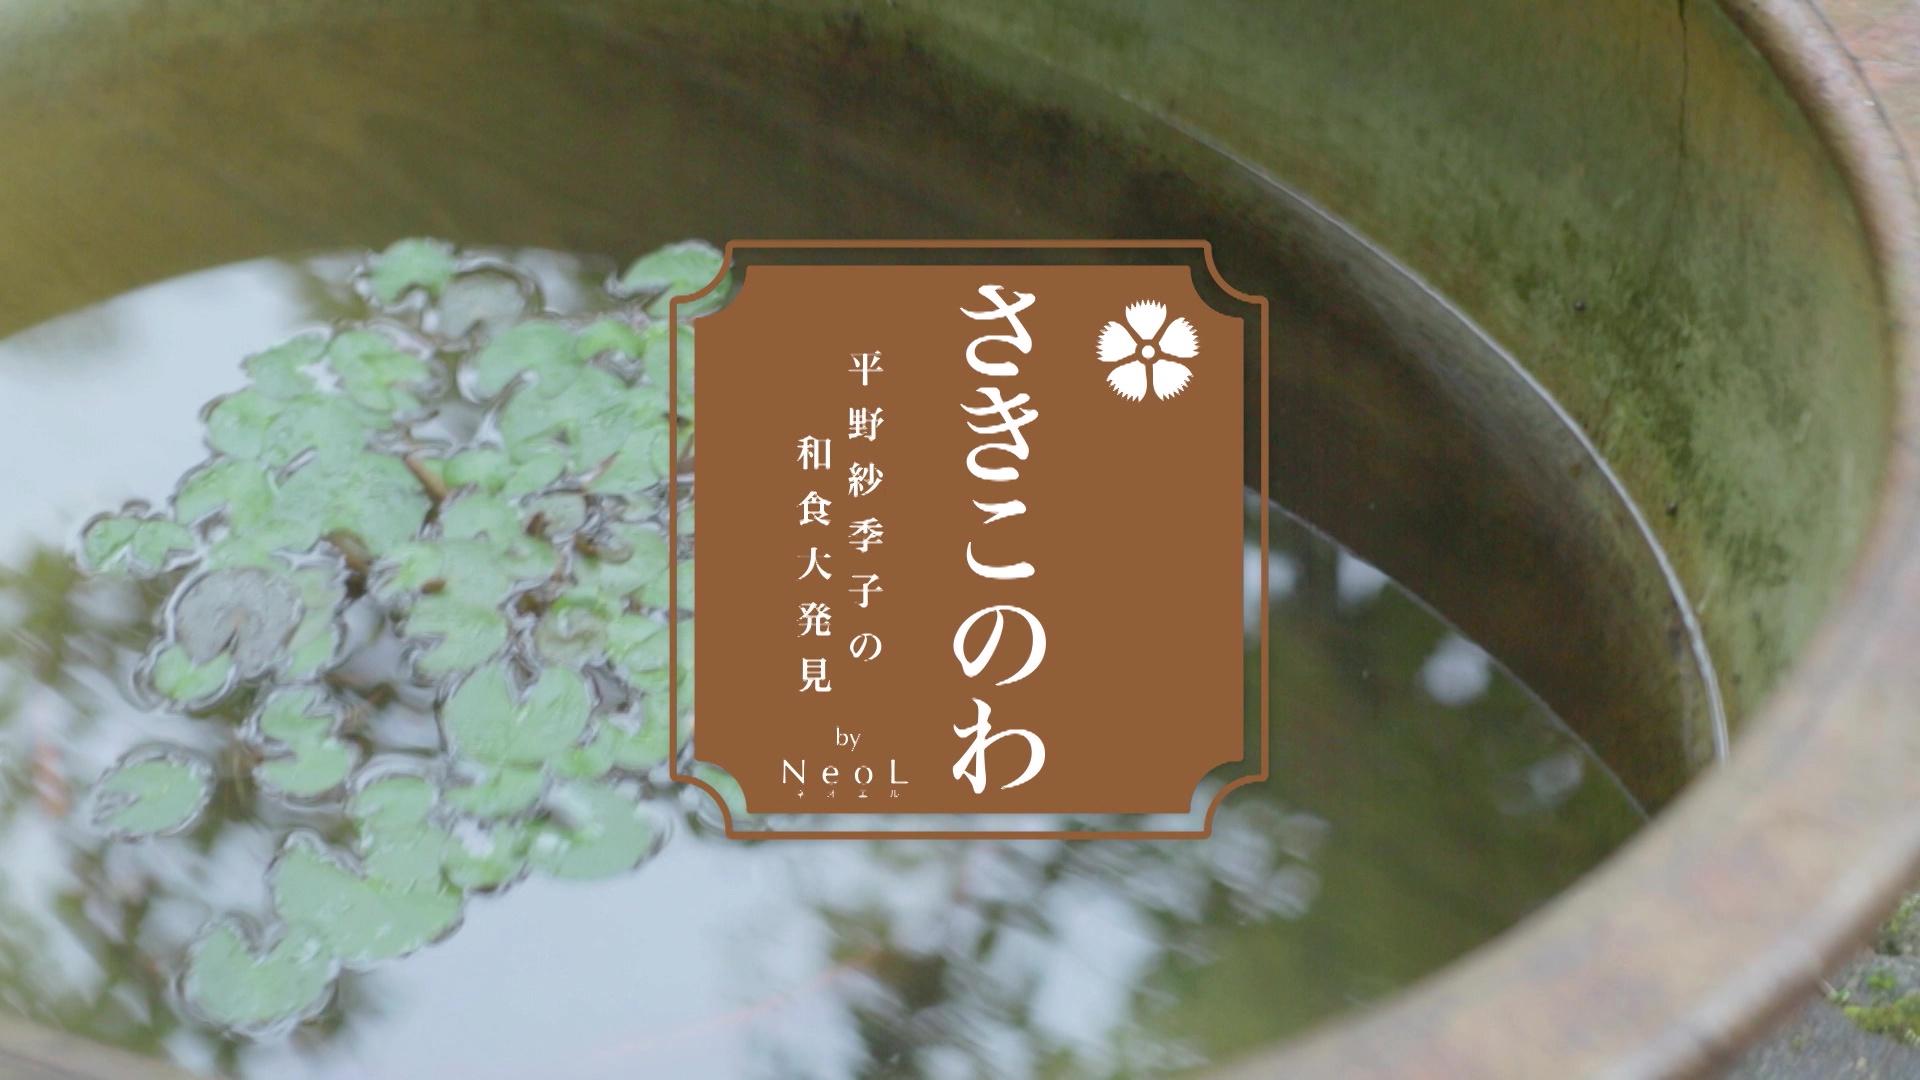 【CS番組】さきこのわ ~平野紗季子の和食大発見~(2014/30min)